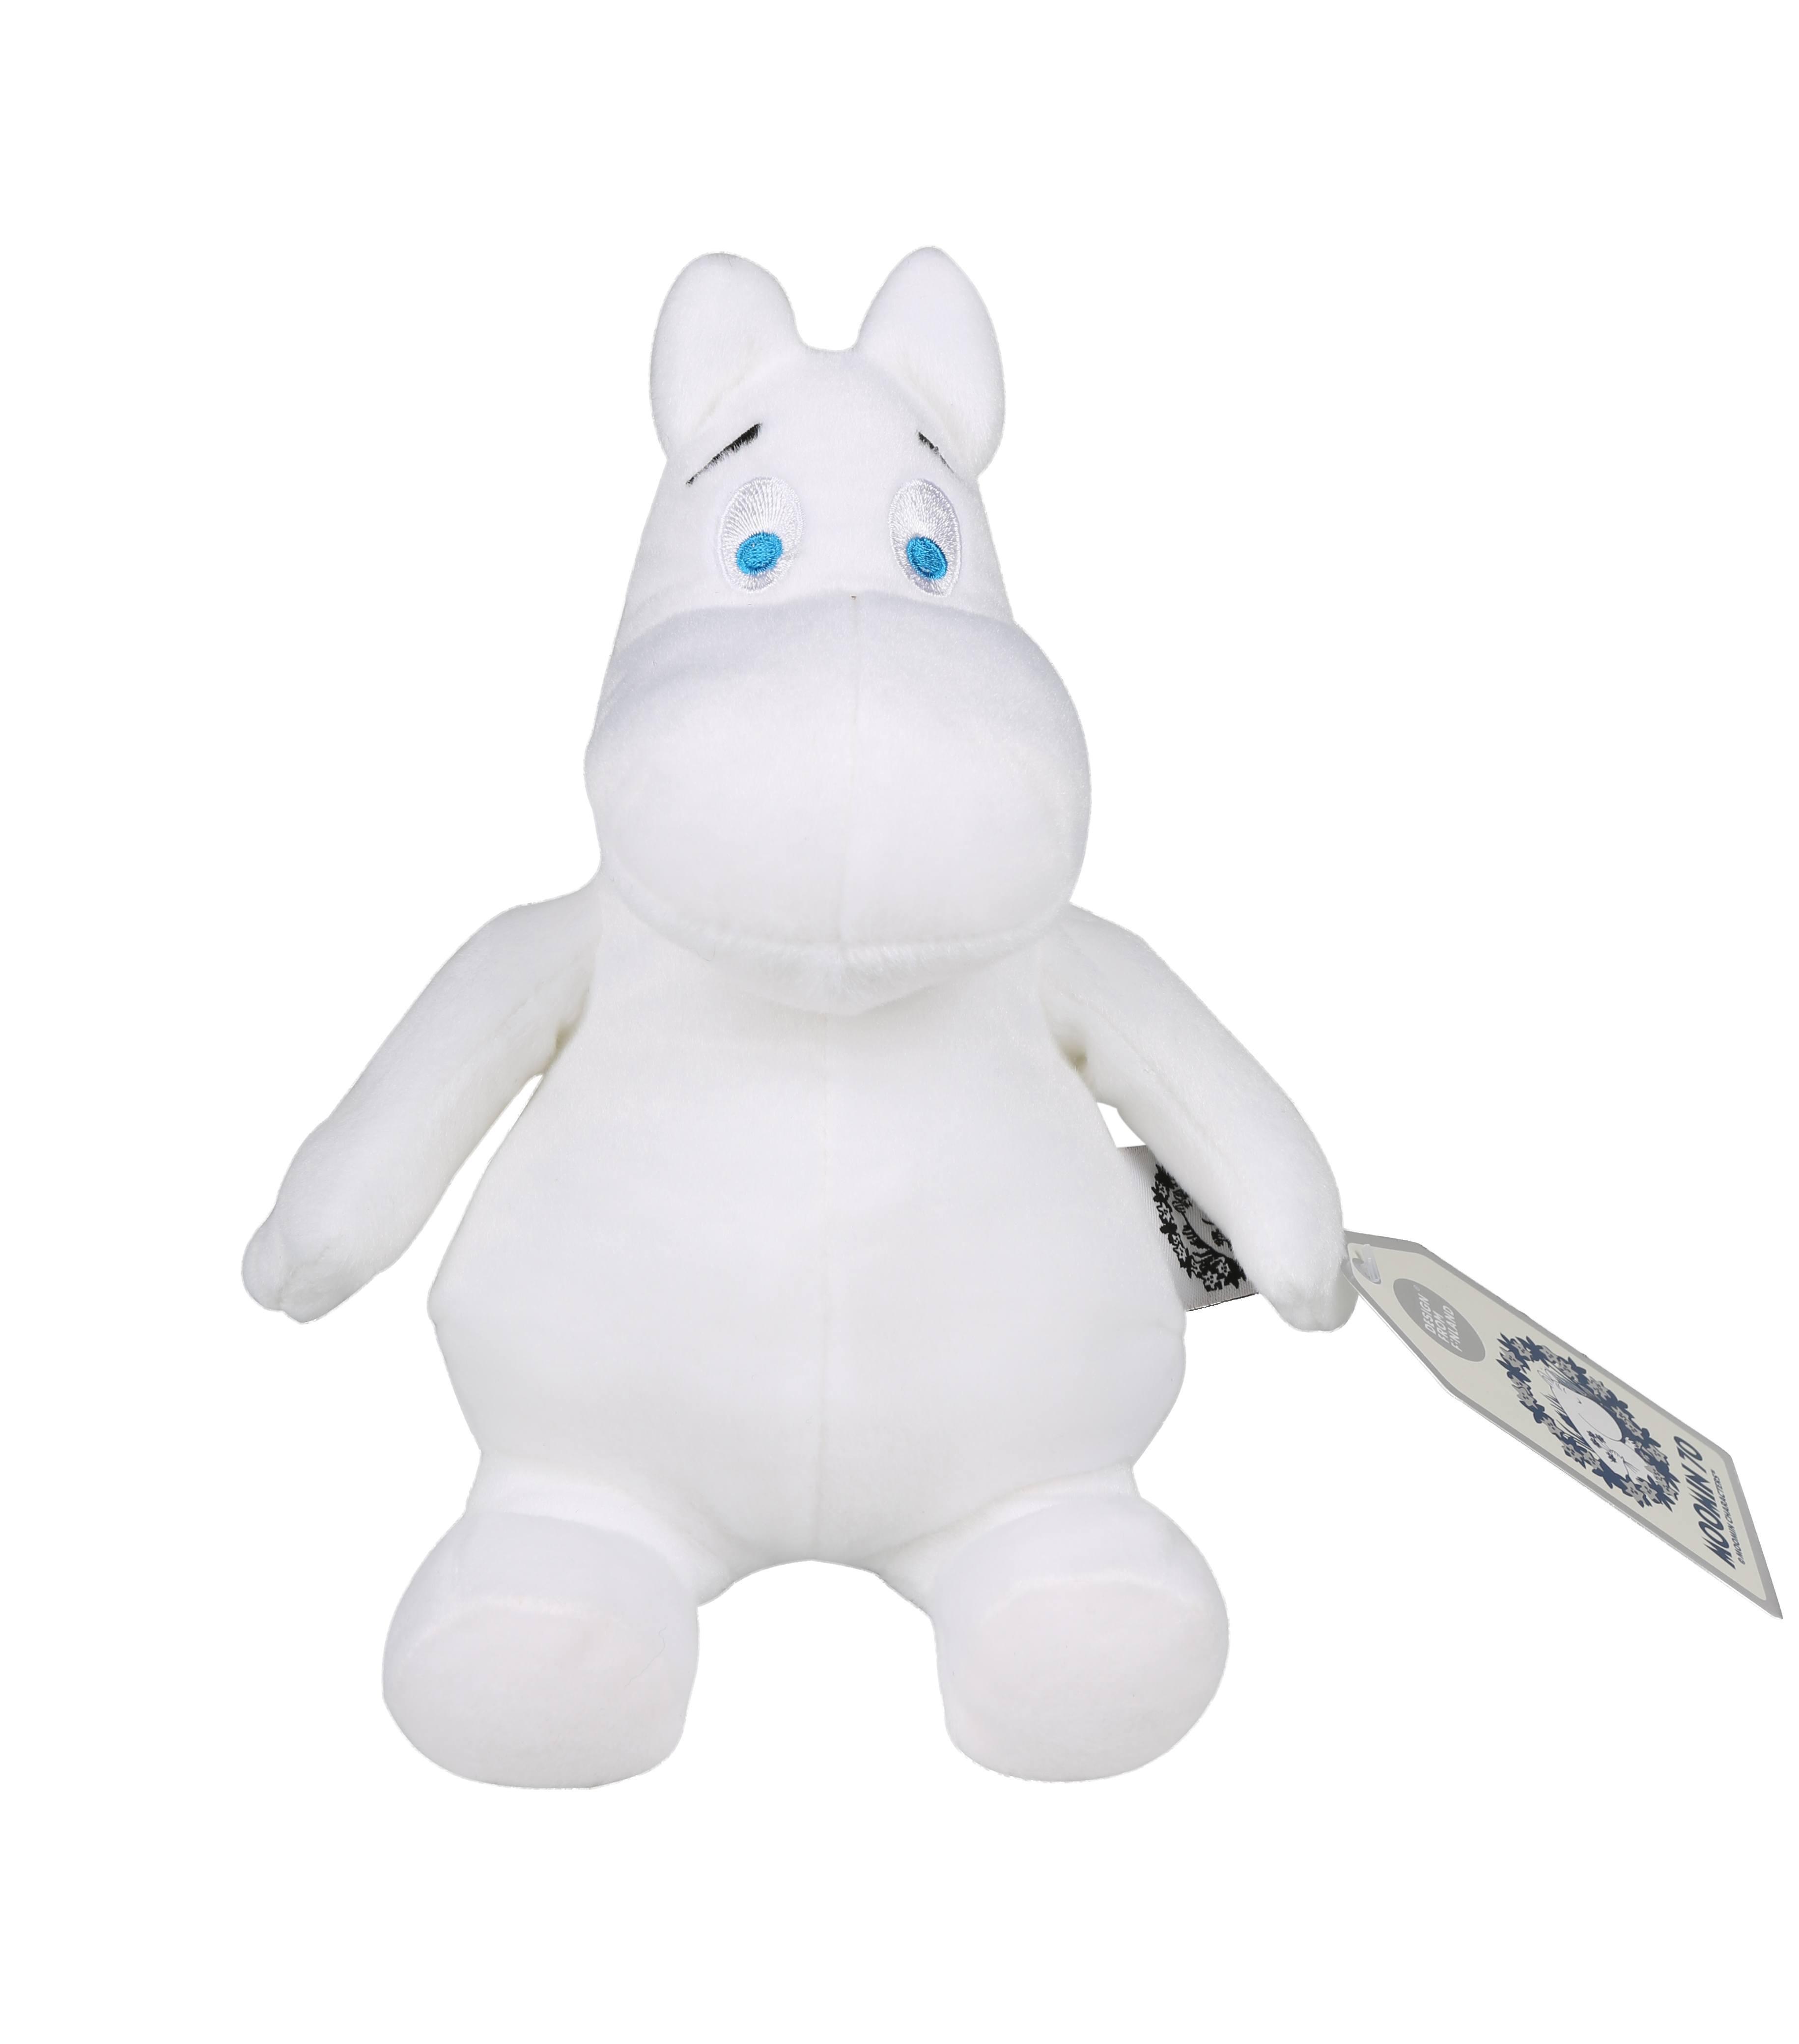 Martinex 70 year celebration Moomin plush toy 22cm